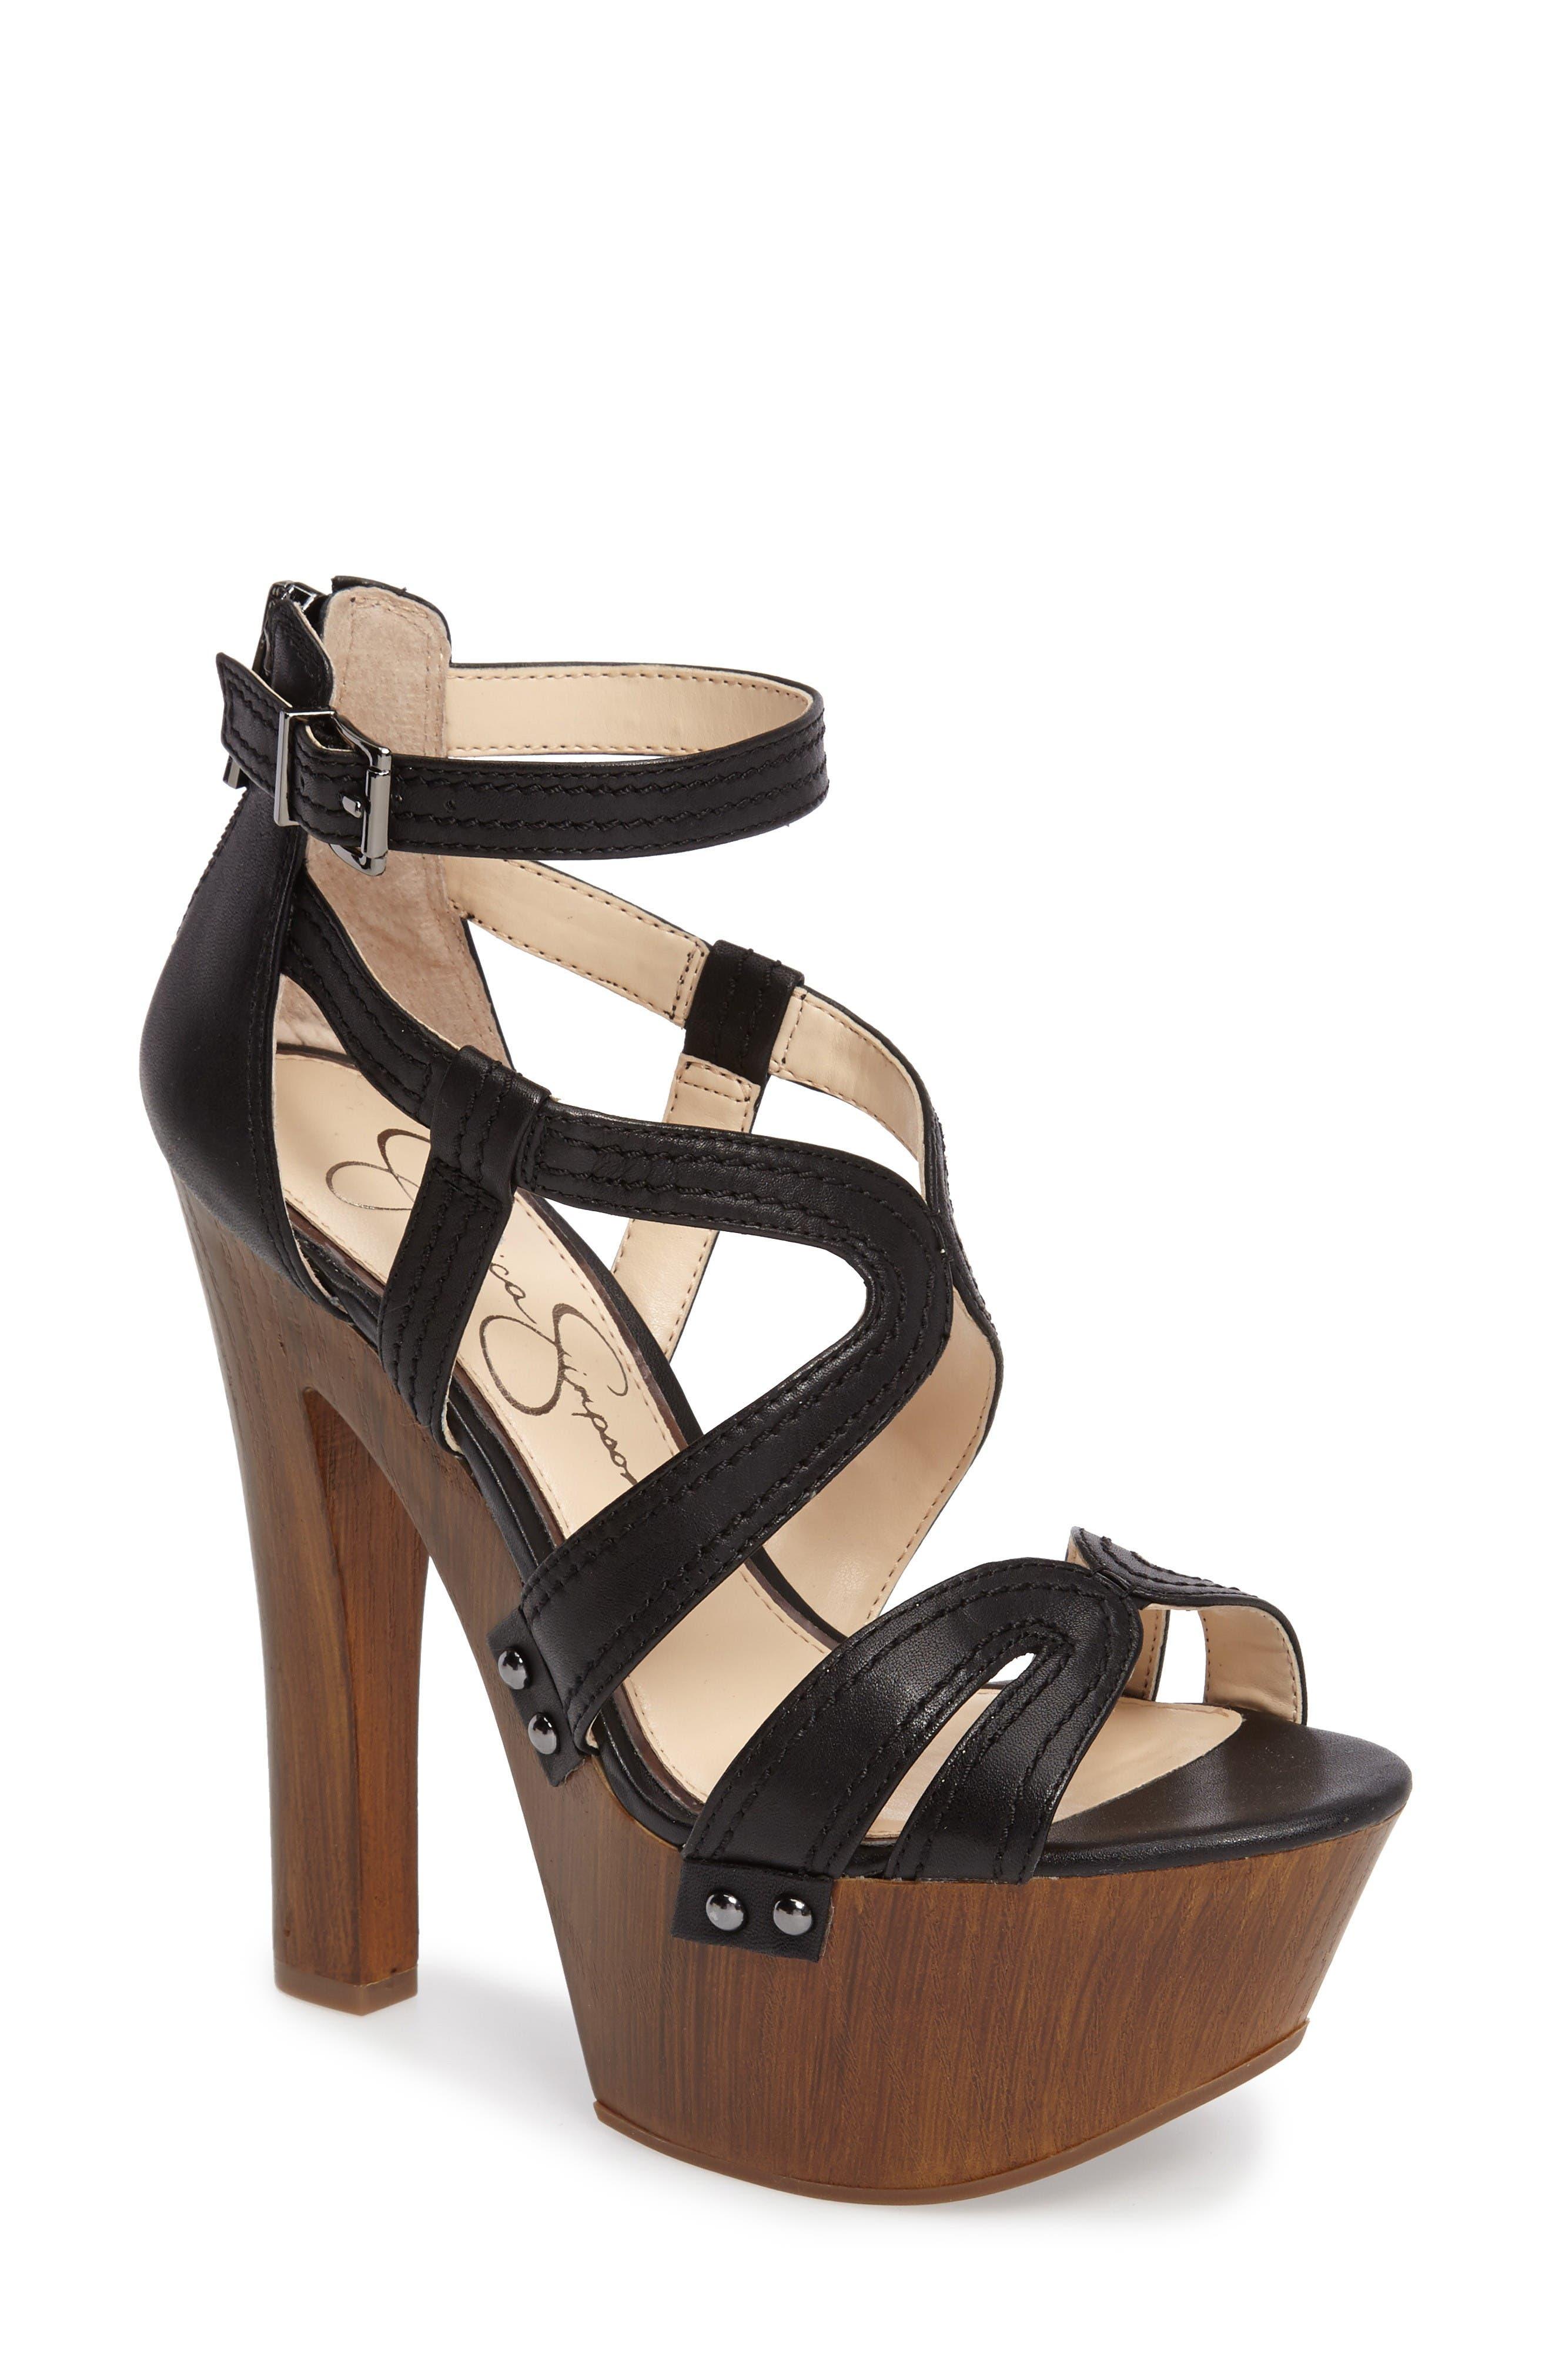 JESSICA SIMPSON Dorrin Platform Sandal